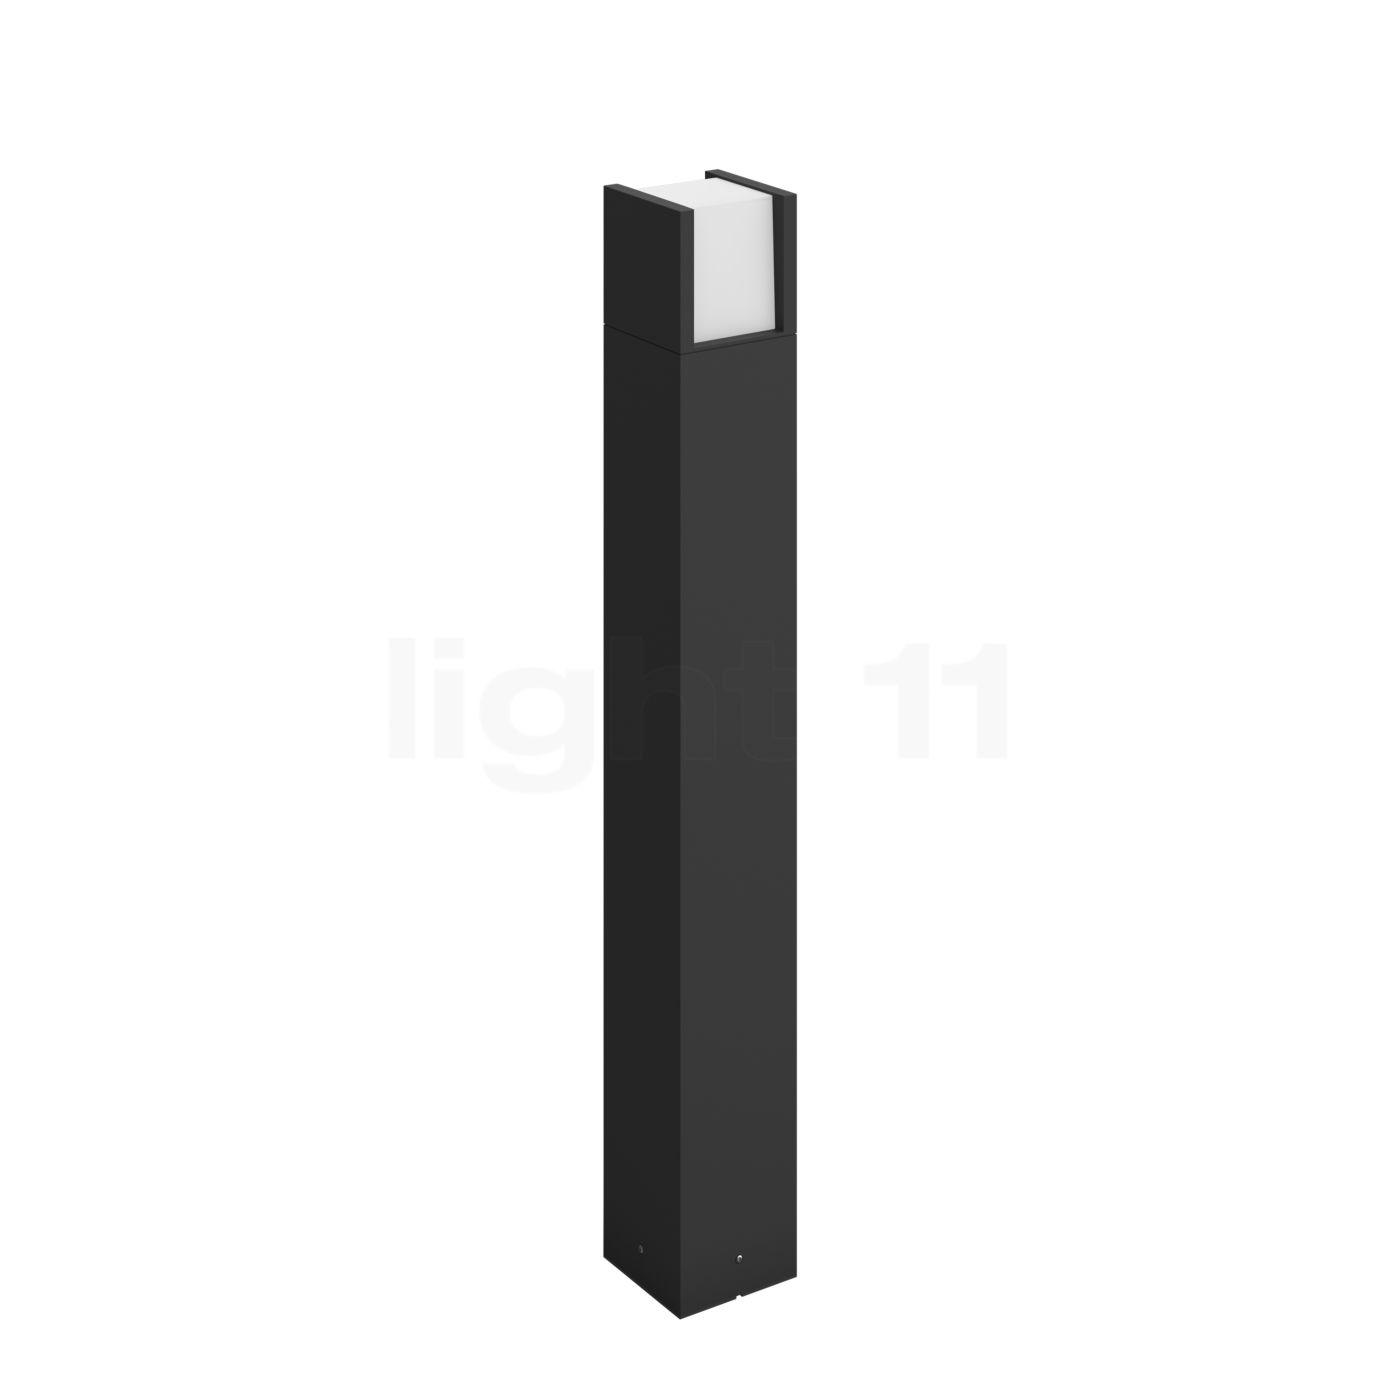 Philips Hue Fuzo Wegeleuchte LED, schwarz 1744830P7